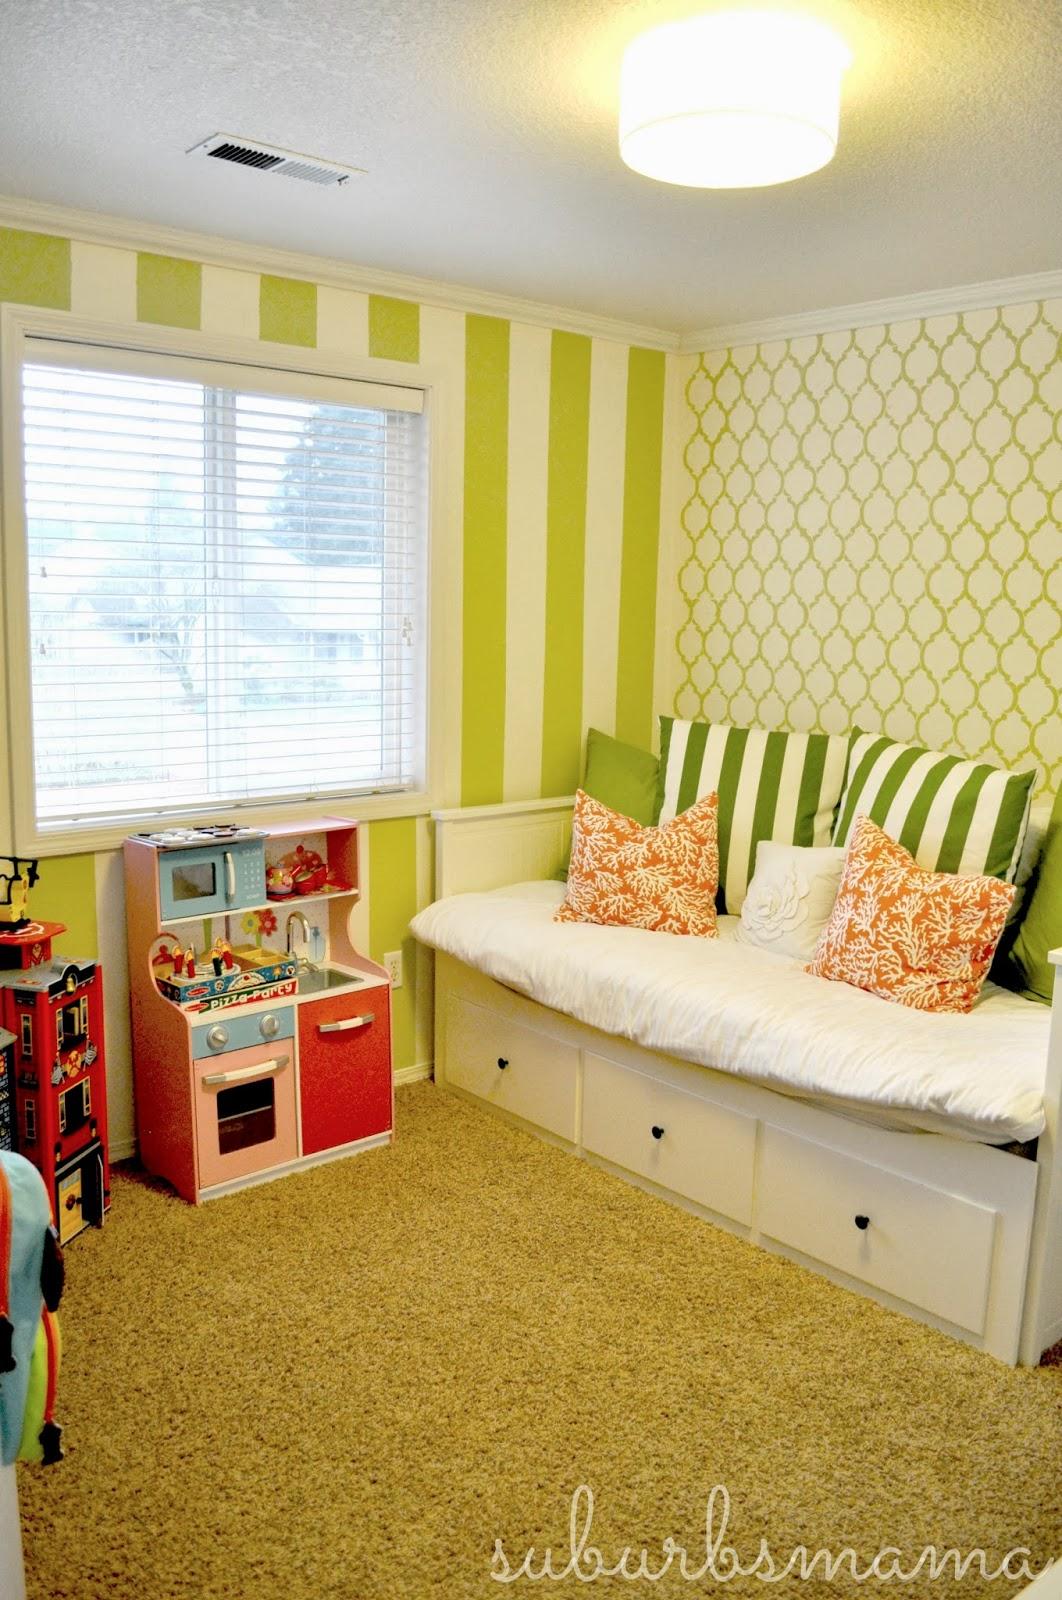 Playroom: Suburbs Mama: Play Room/Guest Room Update